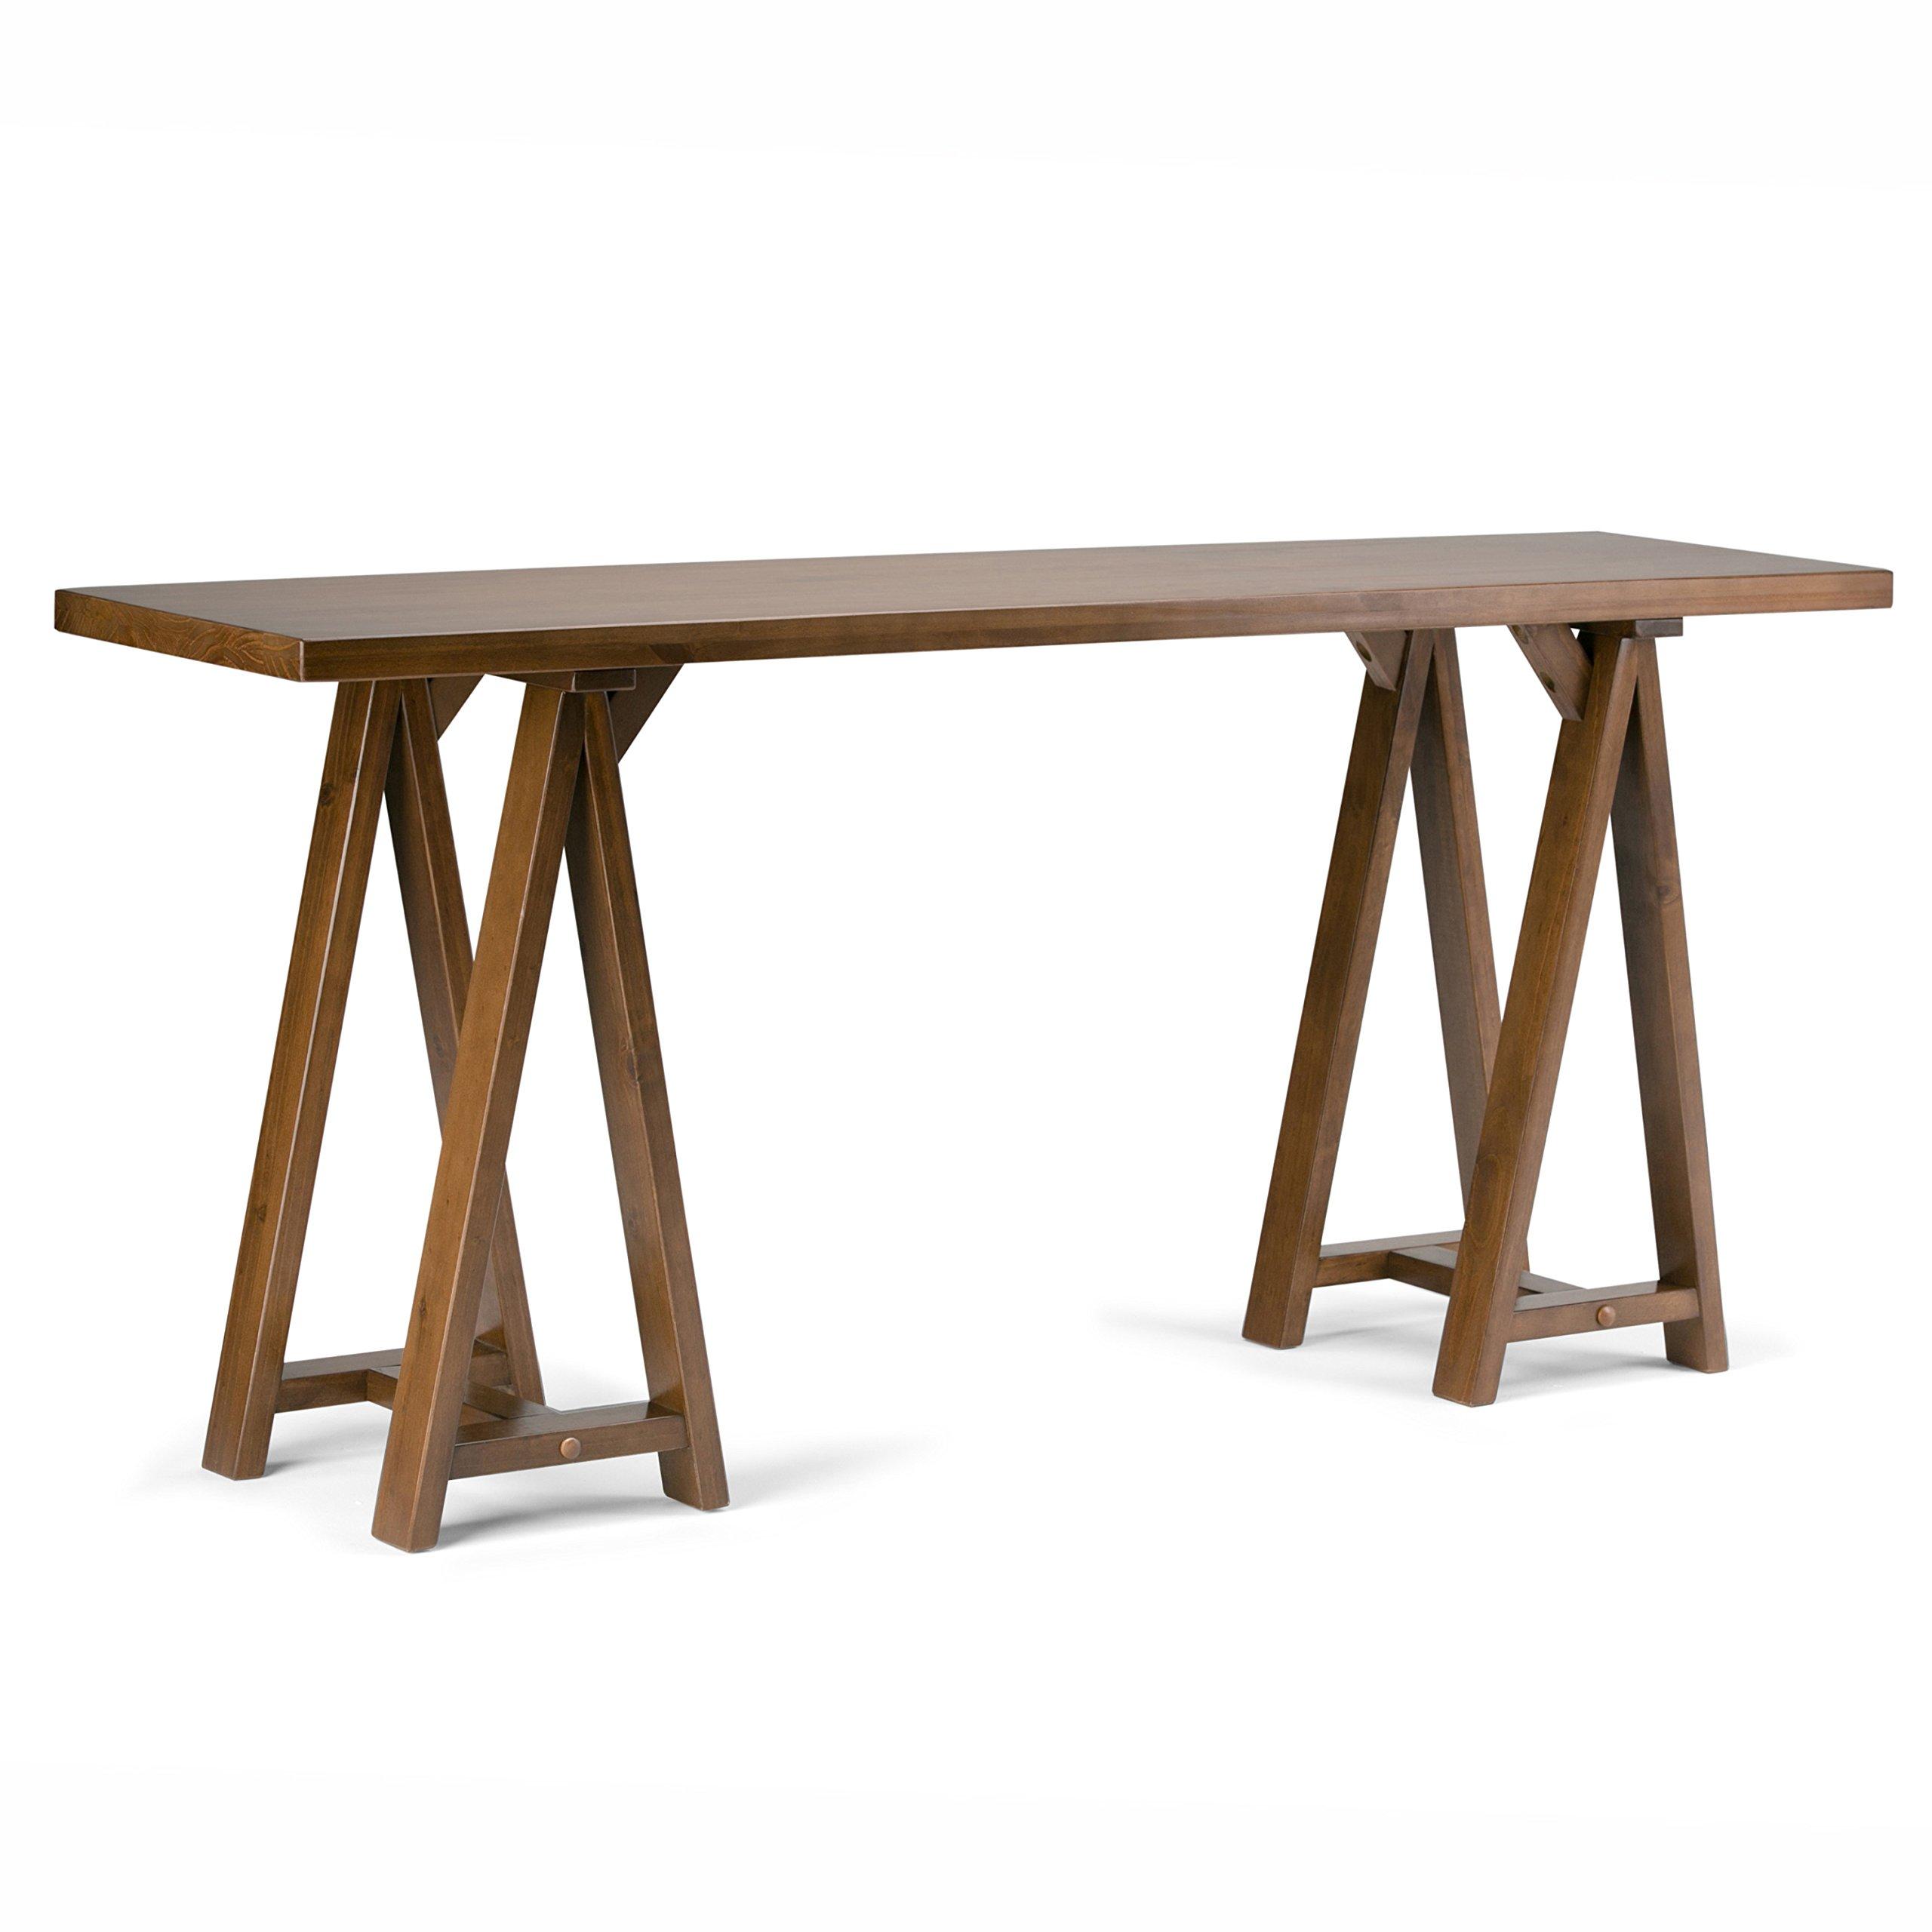 Simpli Home Sawhorse Solid Wood Wide Console Sofa Table, Medium Saddle Brown